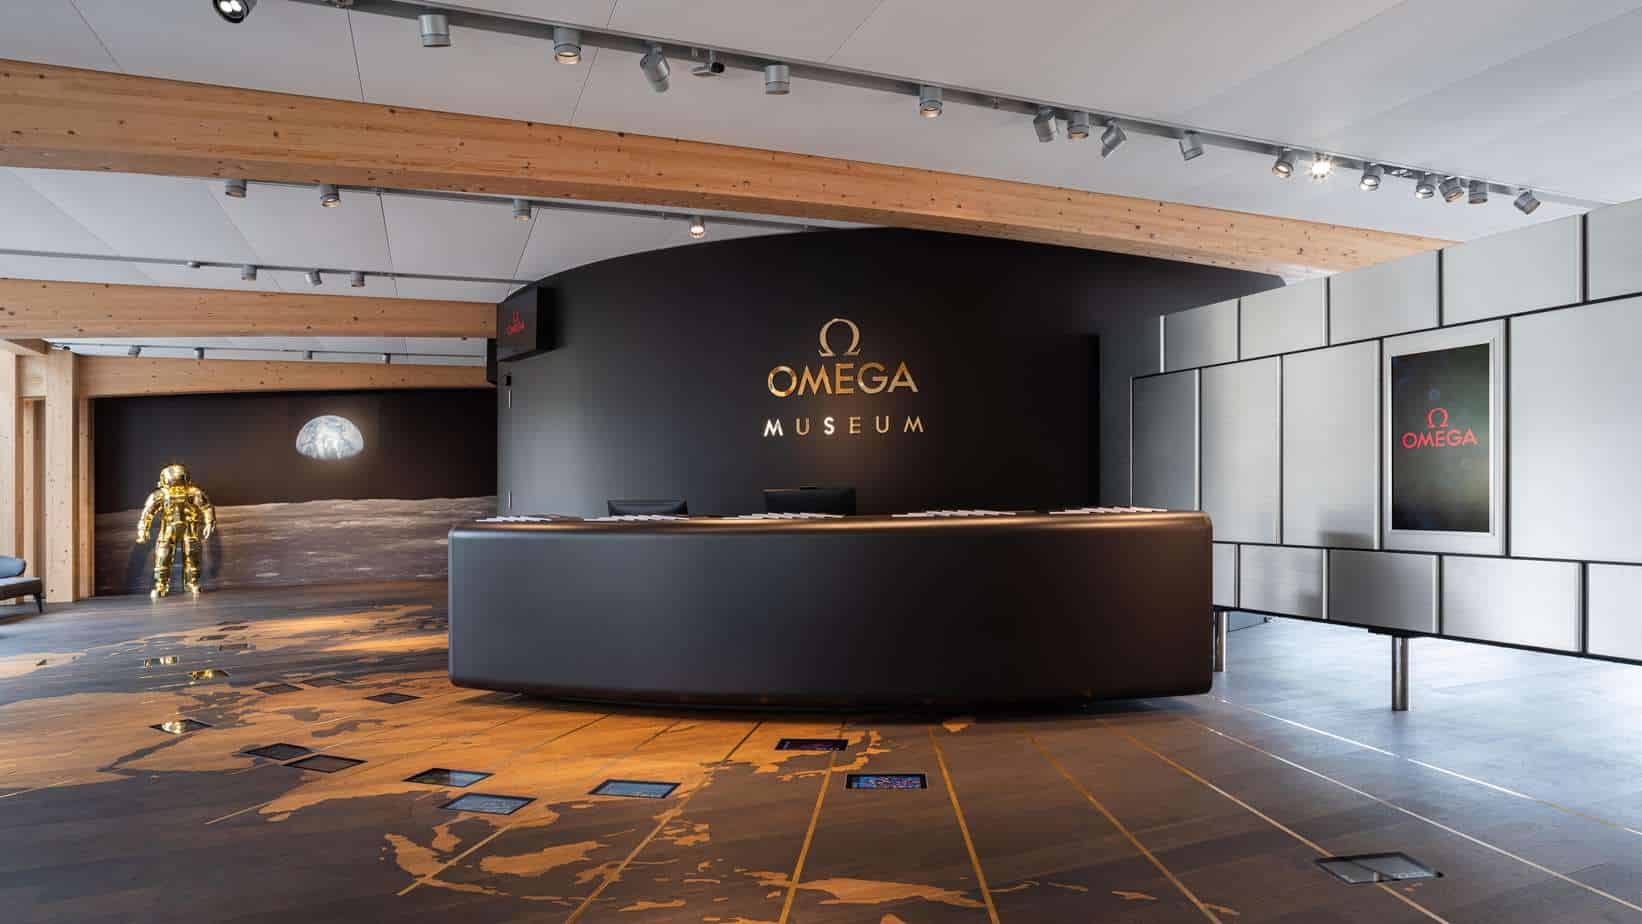 Omega Museum